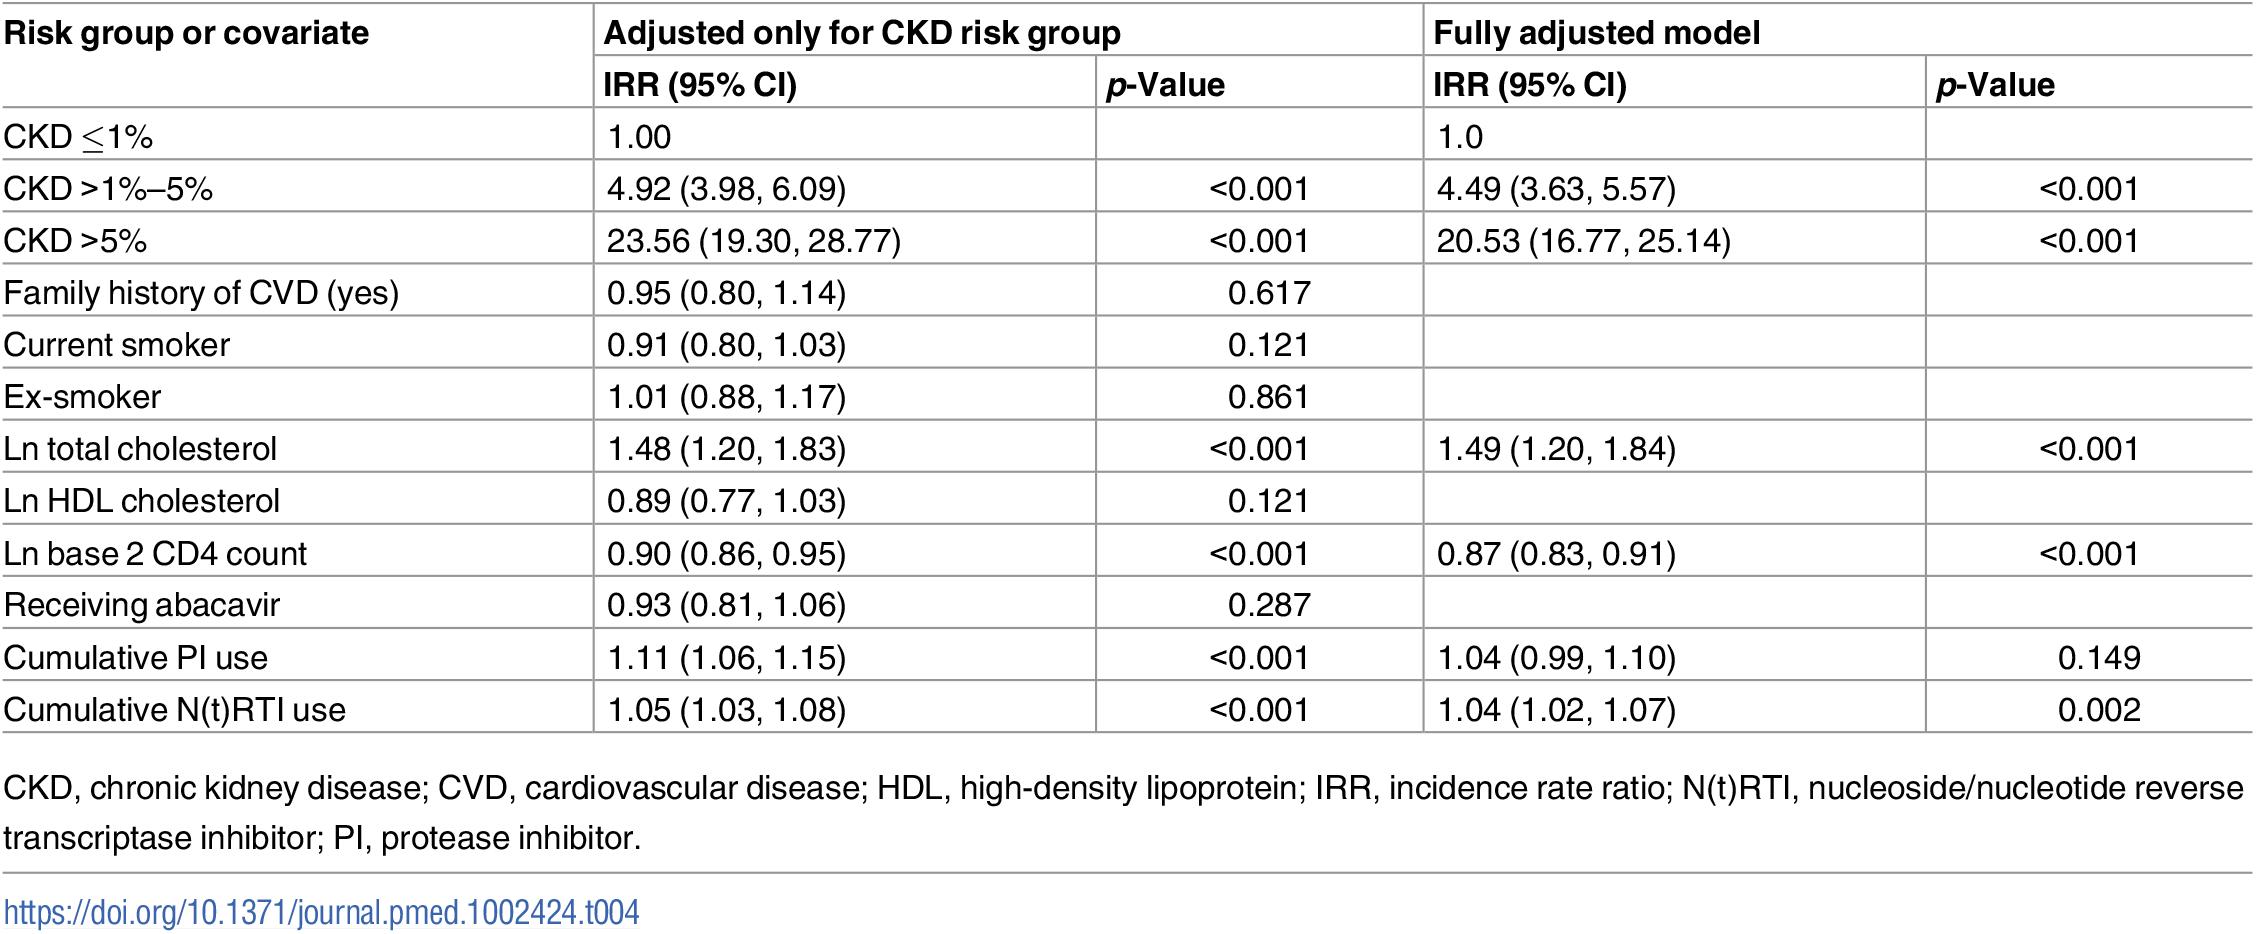 Covariates of CVD risk score as predictors for CKD events adjusted for CKD risk group.